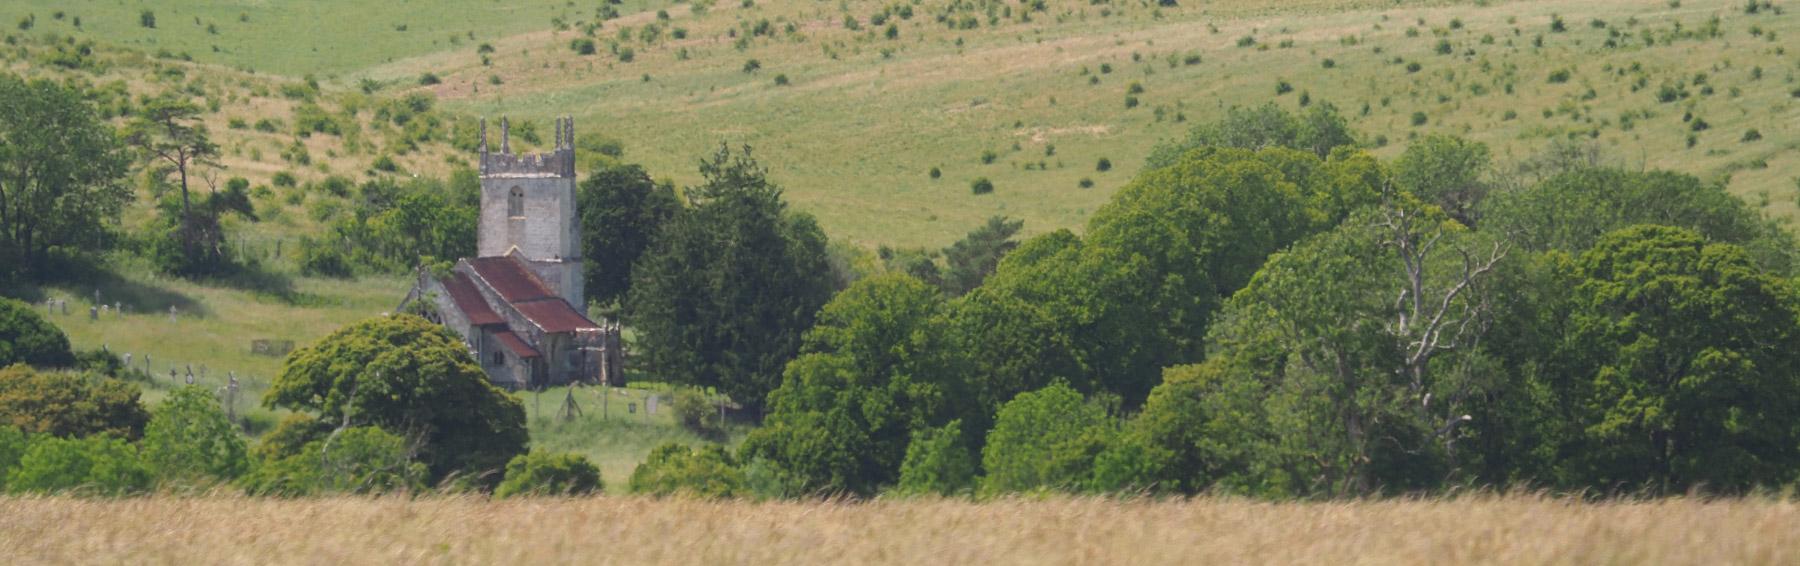 Imber Village Wiltshire